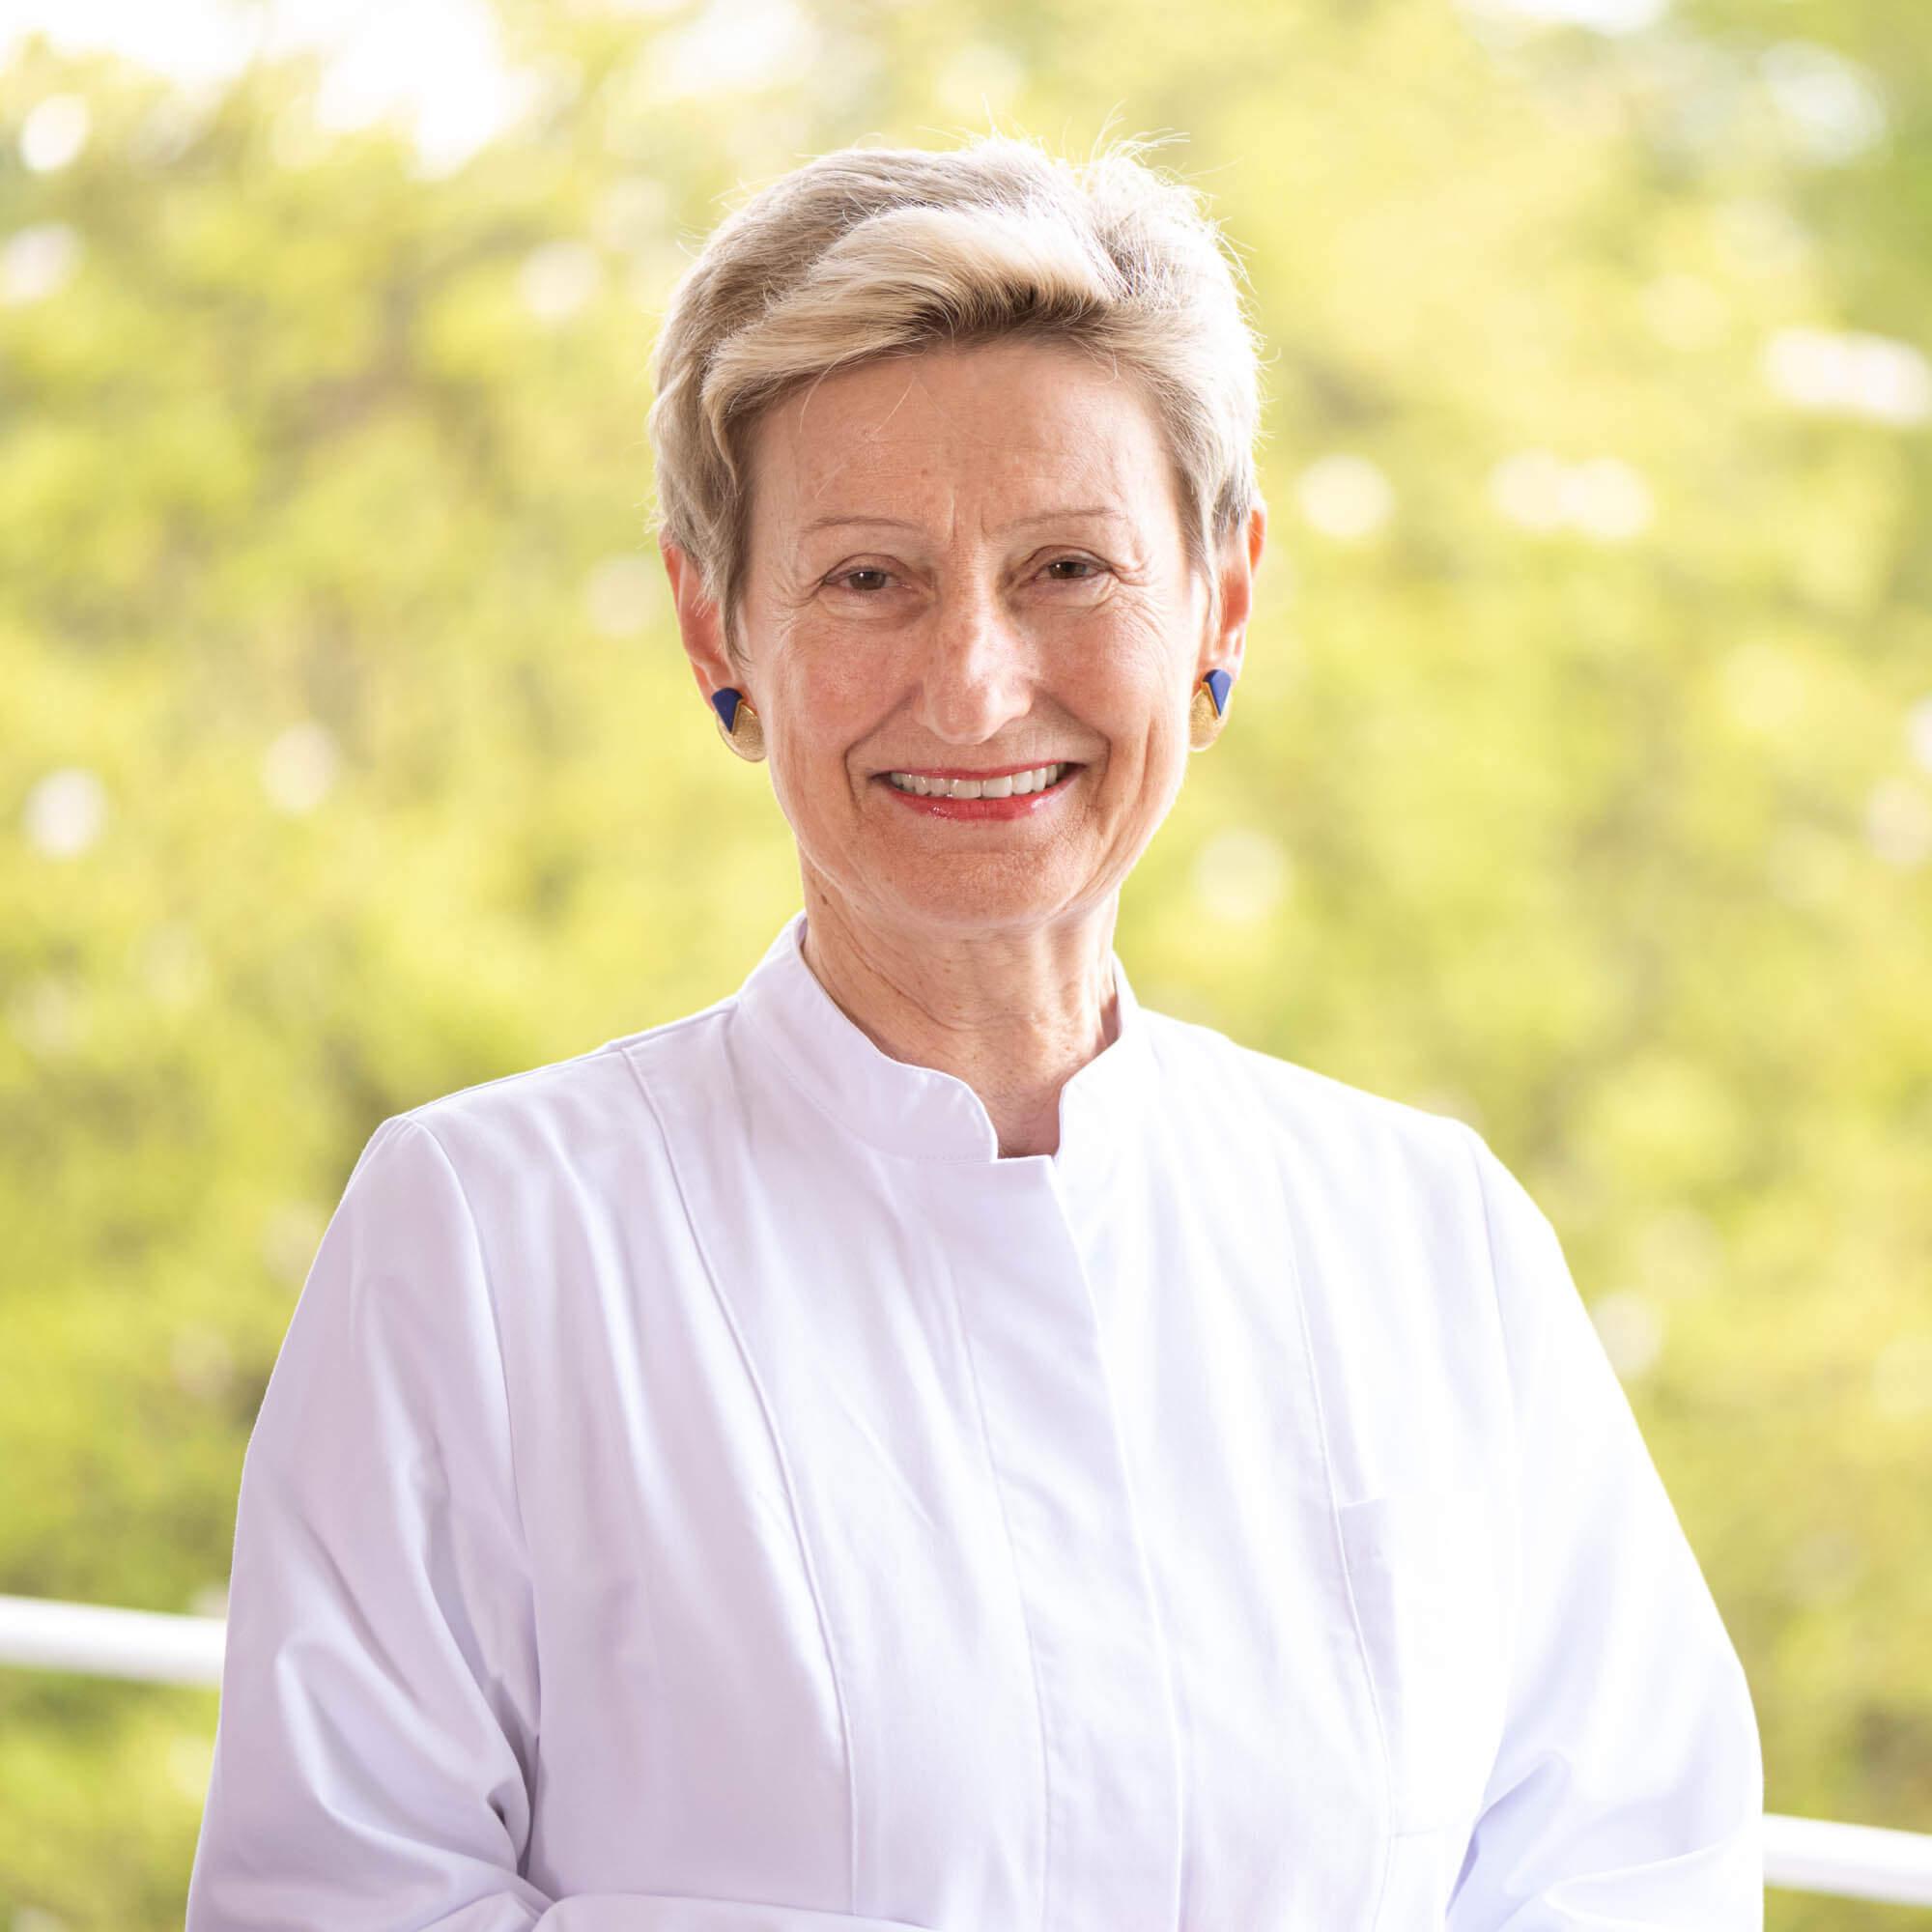 Dra. Eva Lischka